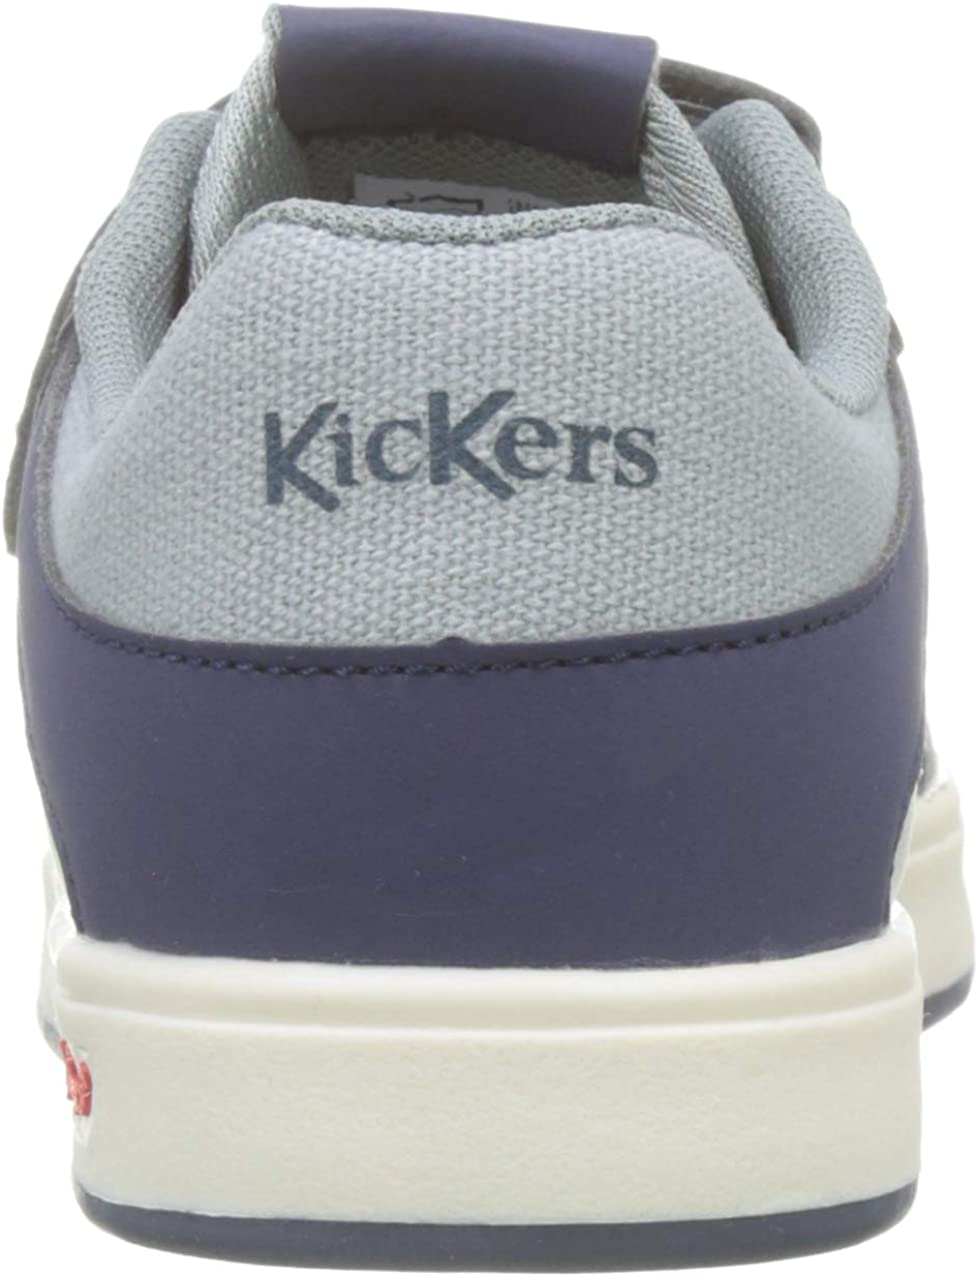 Kickers Gready Low Cdt Baskets Mixte Enfant